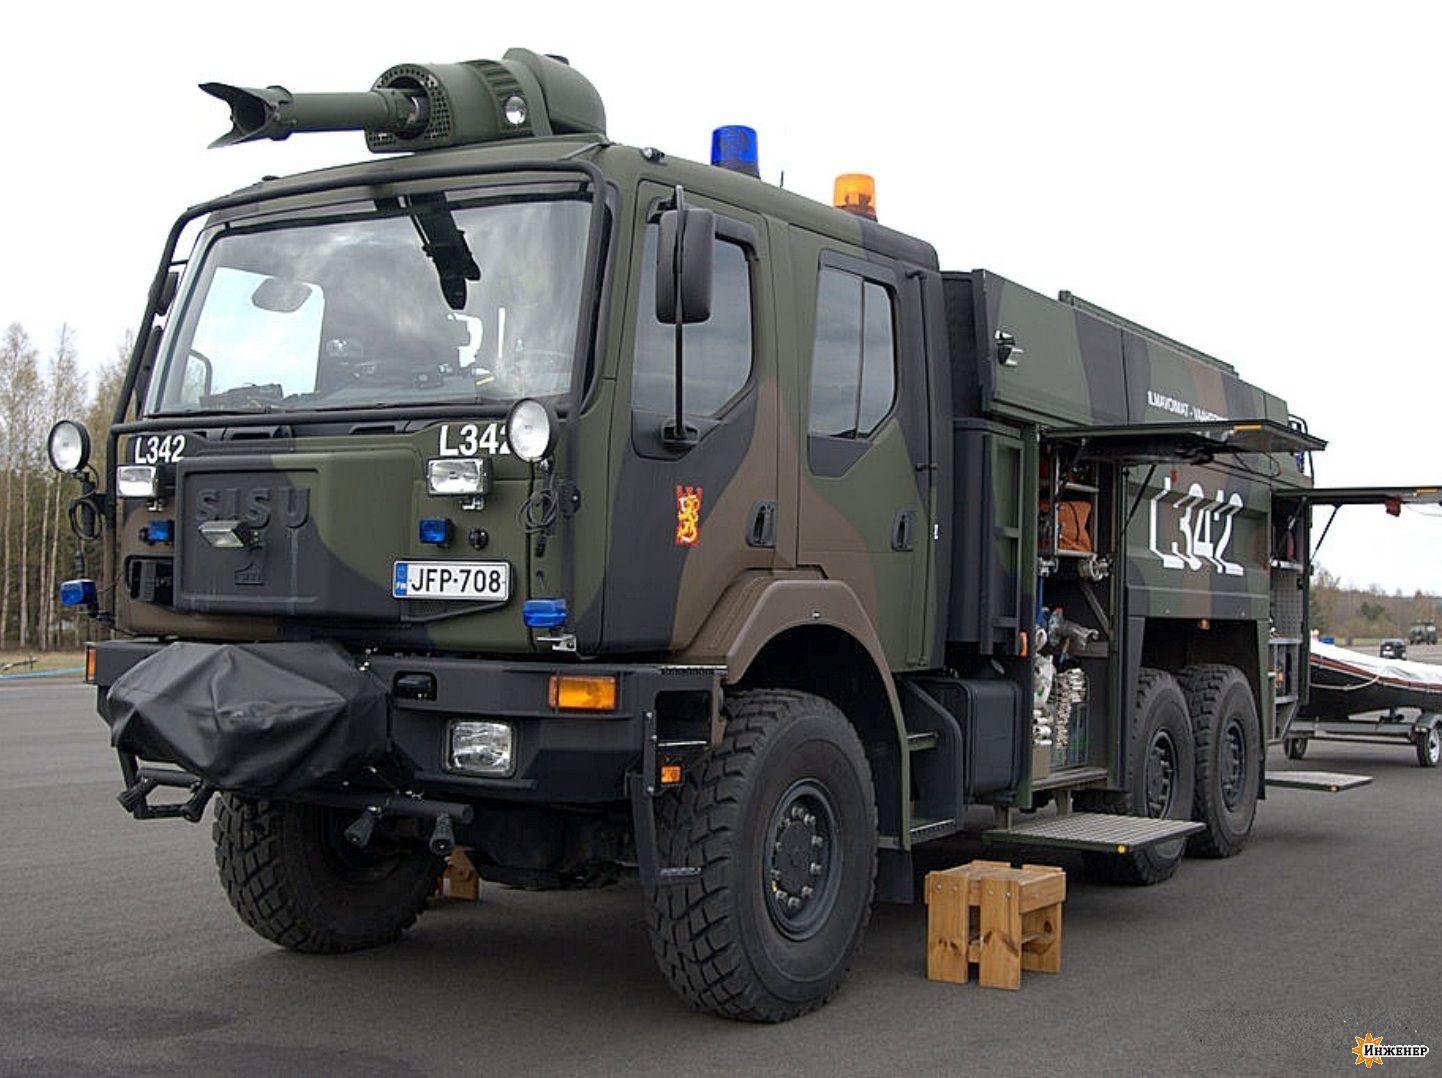 8975_1332842904_truckauto.info_sisuhmtvarff_2.jpg (192.07 Kb)